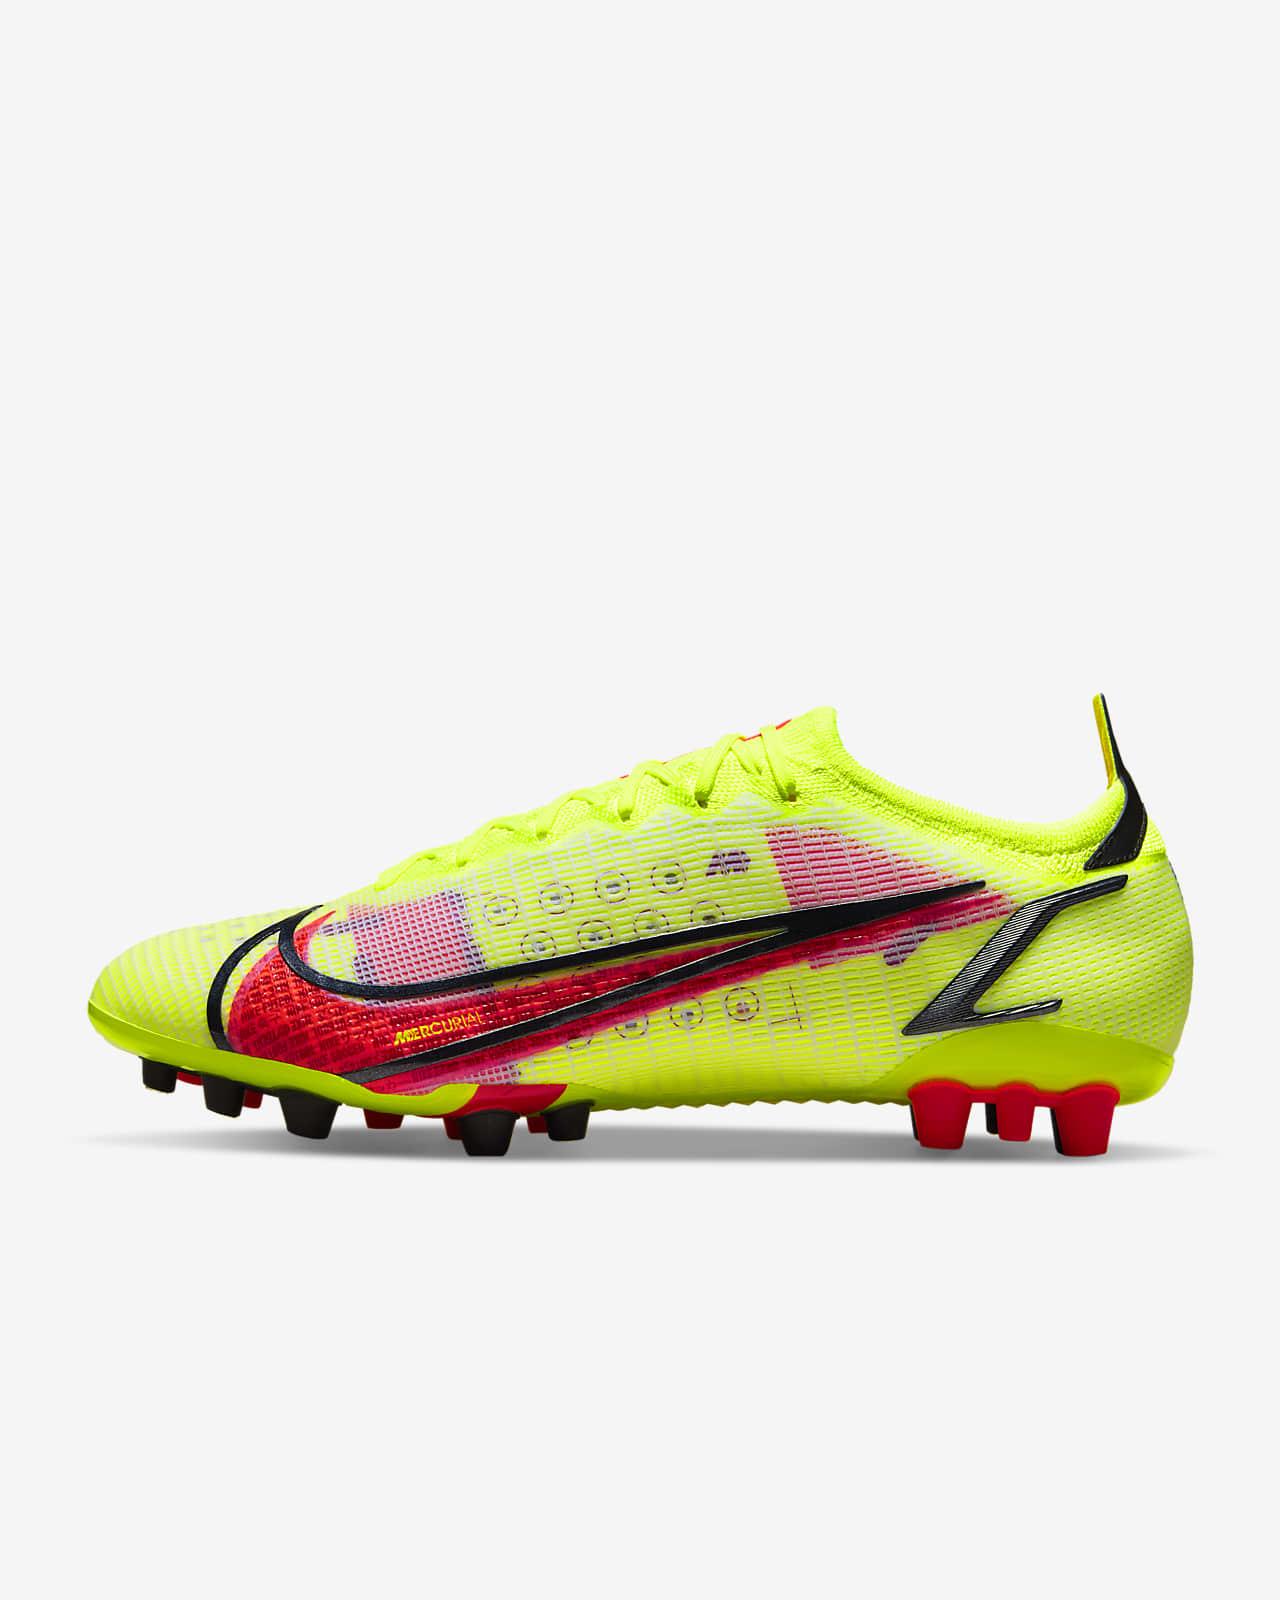 Nike Mercurial Vapor 14 Elite AG Fußballschuh für Kunstrasen